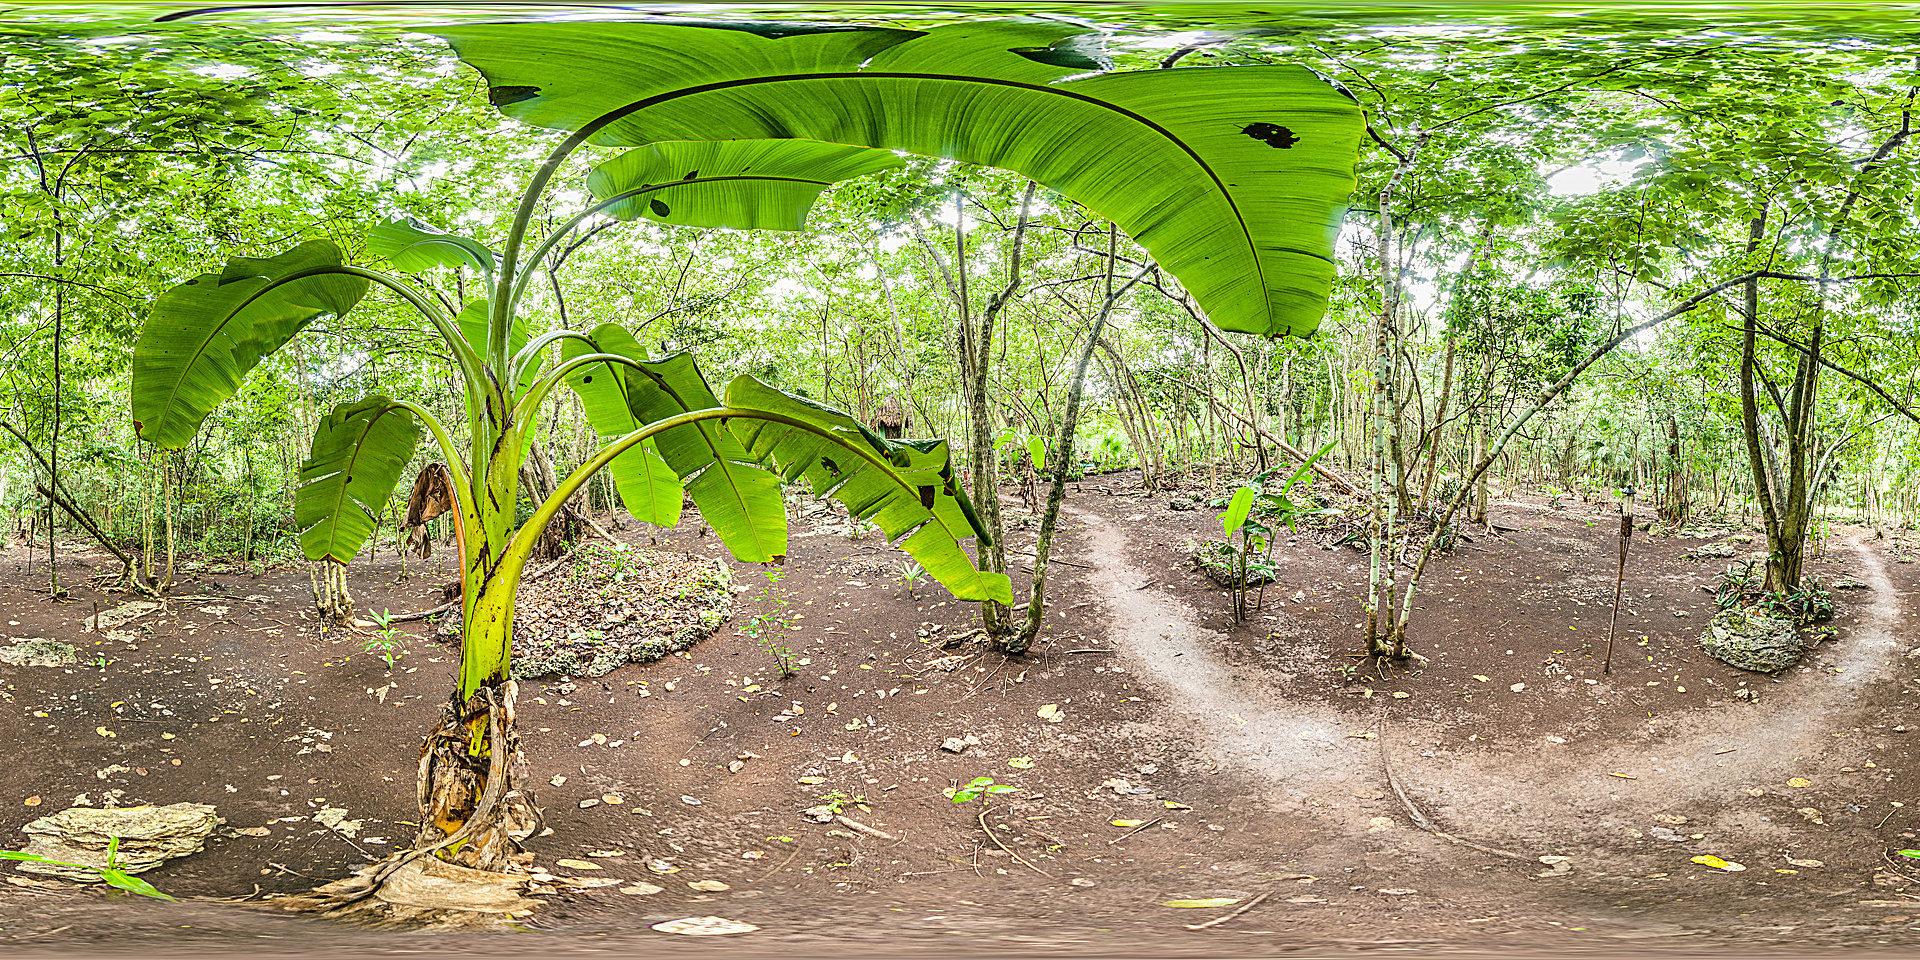 Bananenpflanze im Regenwald von Mexiko - Panorama Fotos